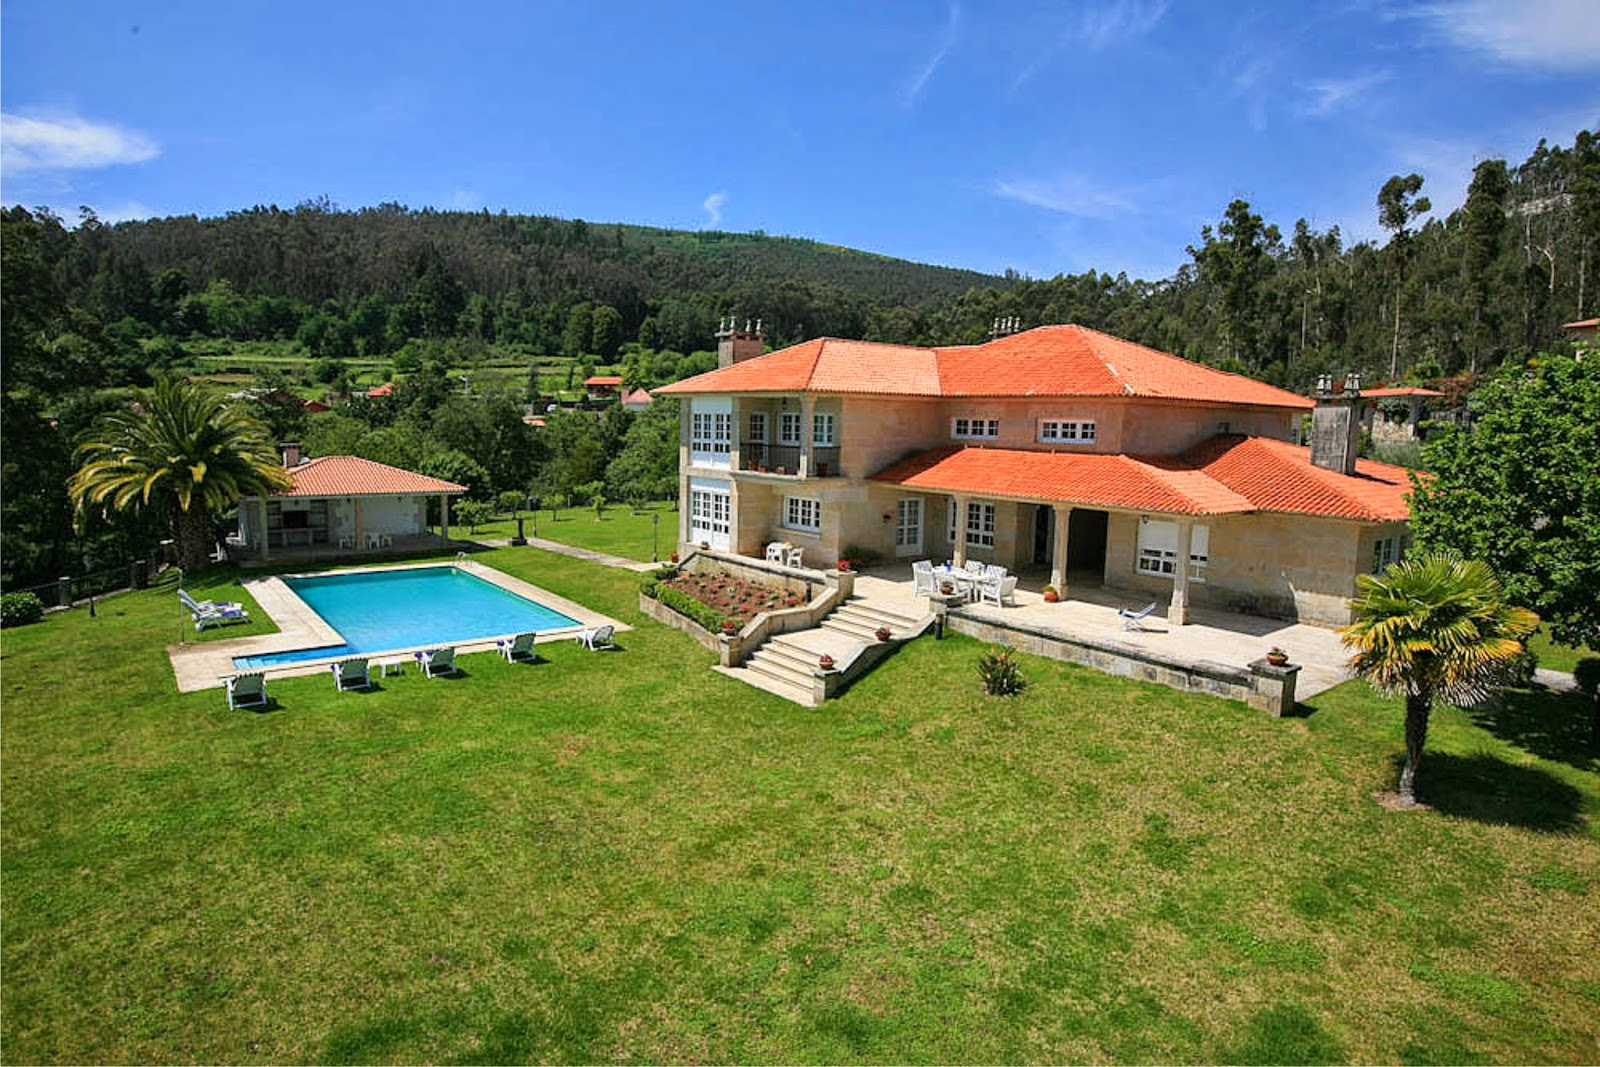 Casa en venta en samieira gabinete inmobiliario for Busco casa en renta